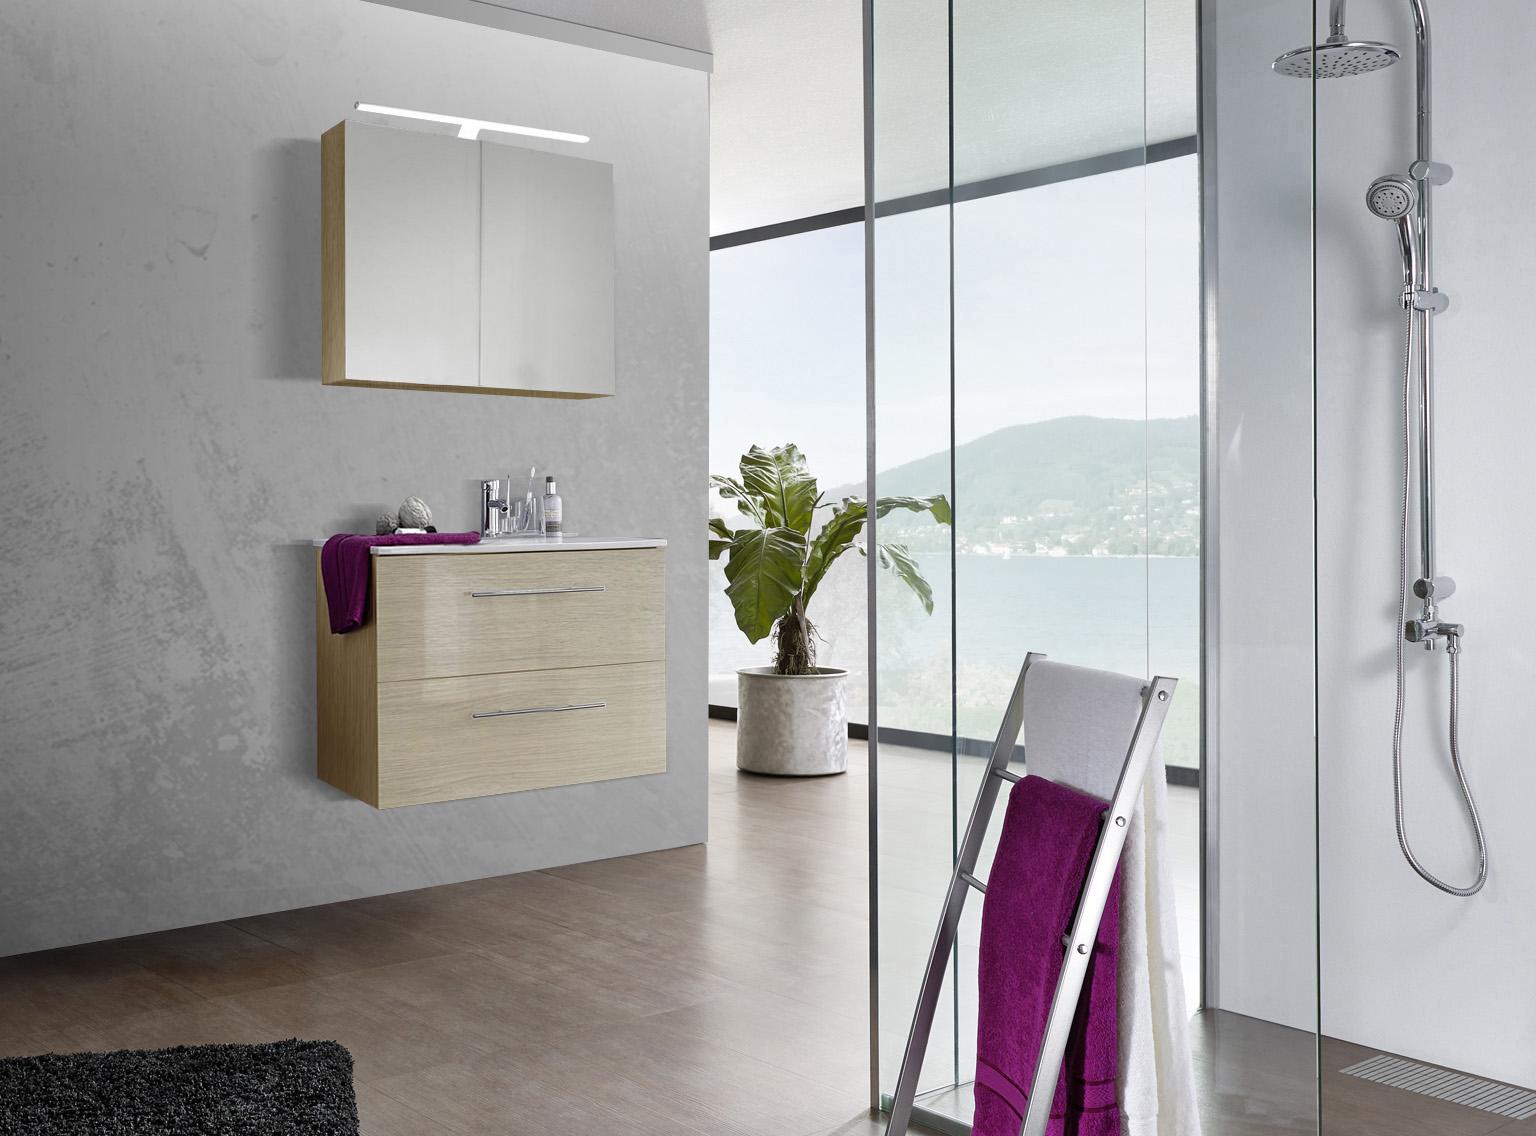 sam 2tlg badezimmer set sonomaeiche 80 cm verena demn chst. Black Bedroom Furniture Sets. Home Design Ideas